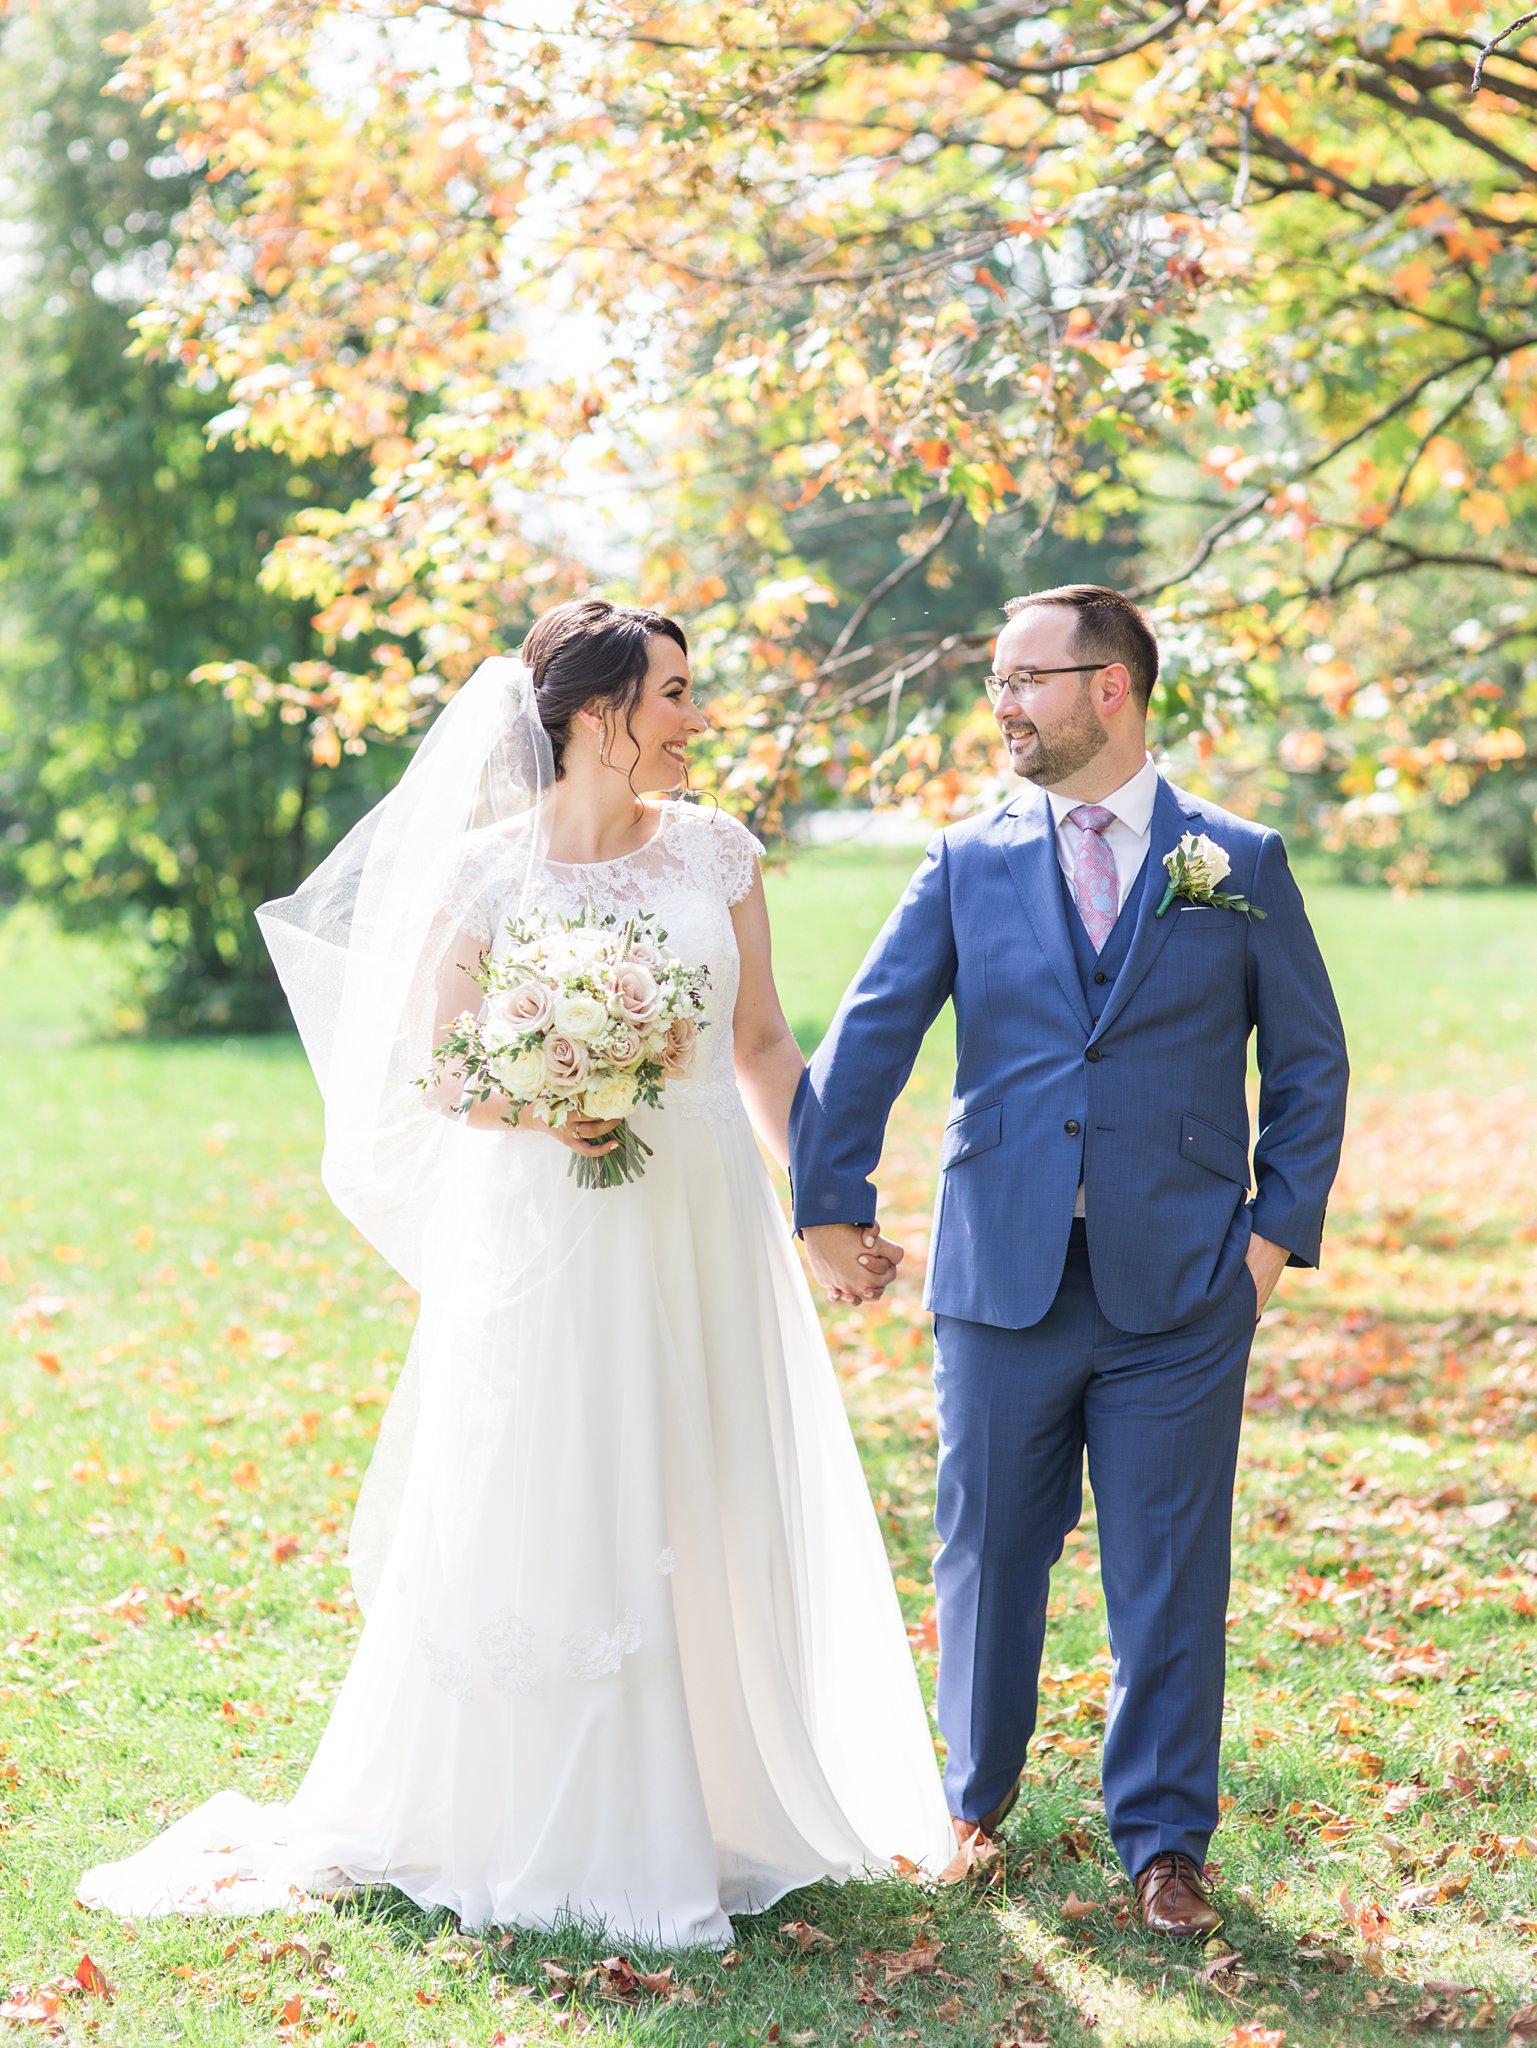 Fall leaves, September wedding, Britannia Yacht Club Wedding Photos, Amy Pinder Photography